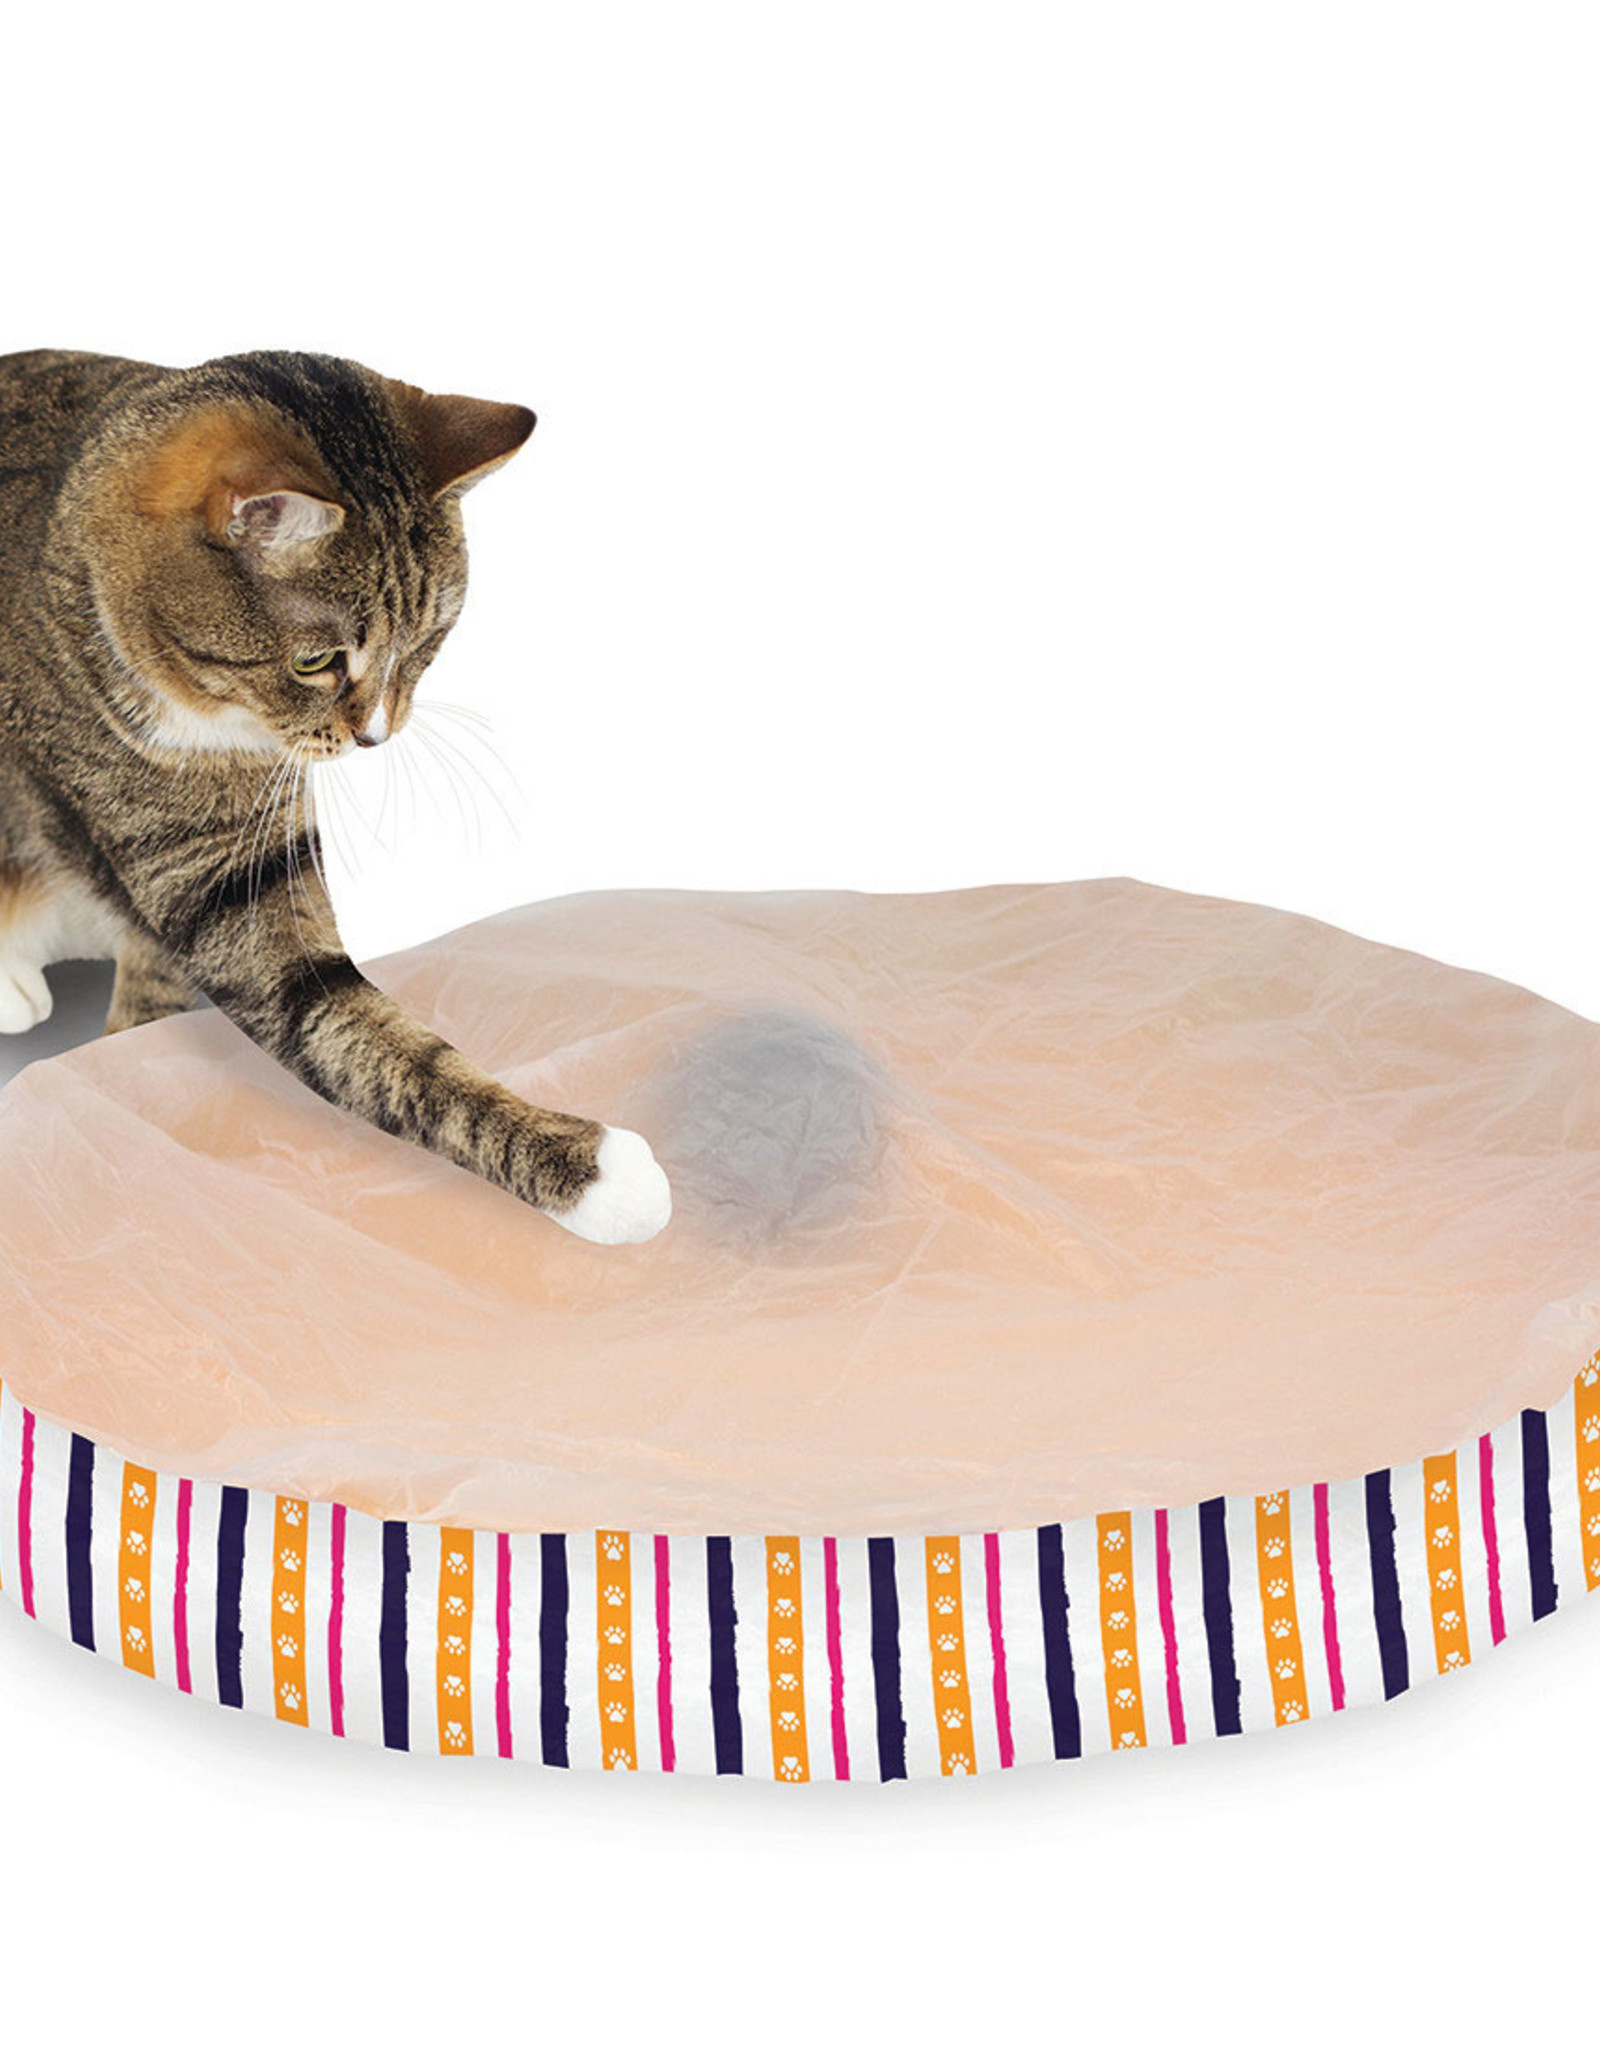 COASTAL PET PRODUCTS INC CAT TOY TURBO RANDOM ROLLER